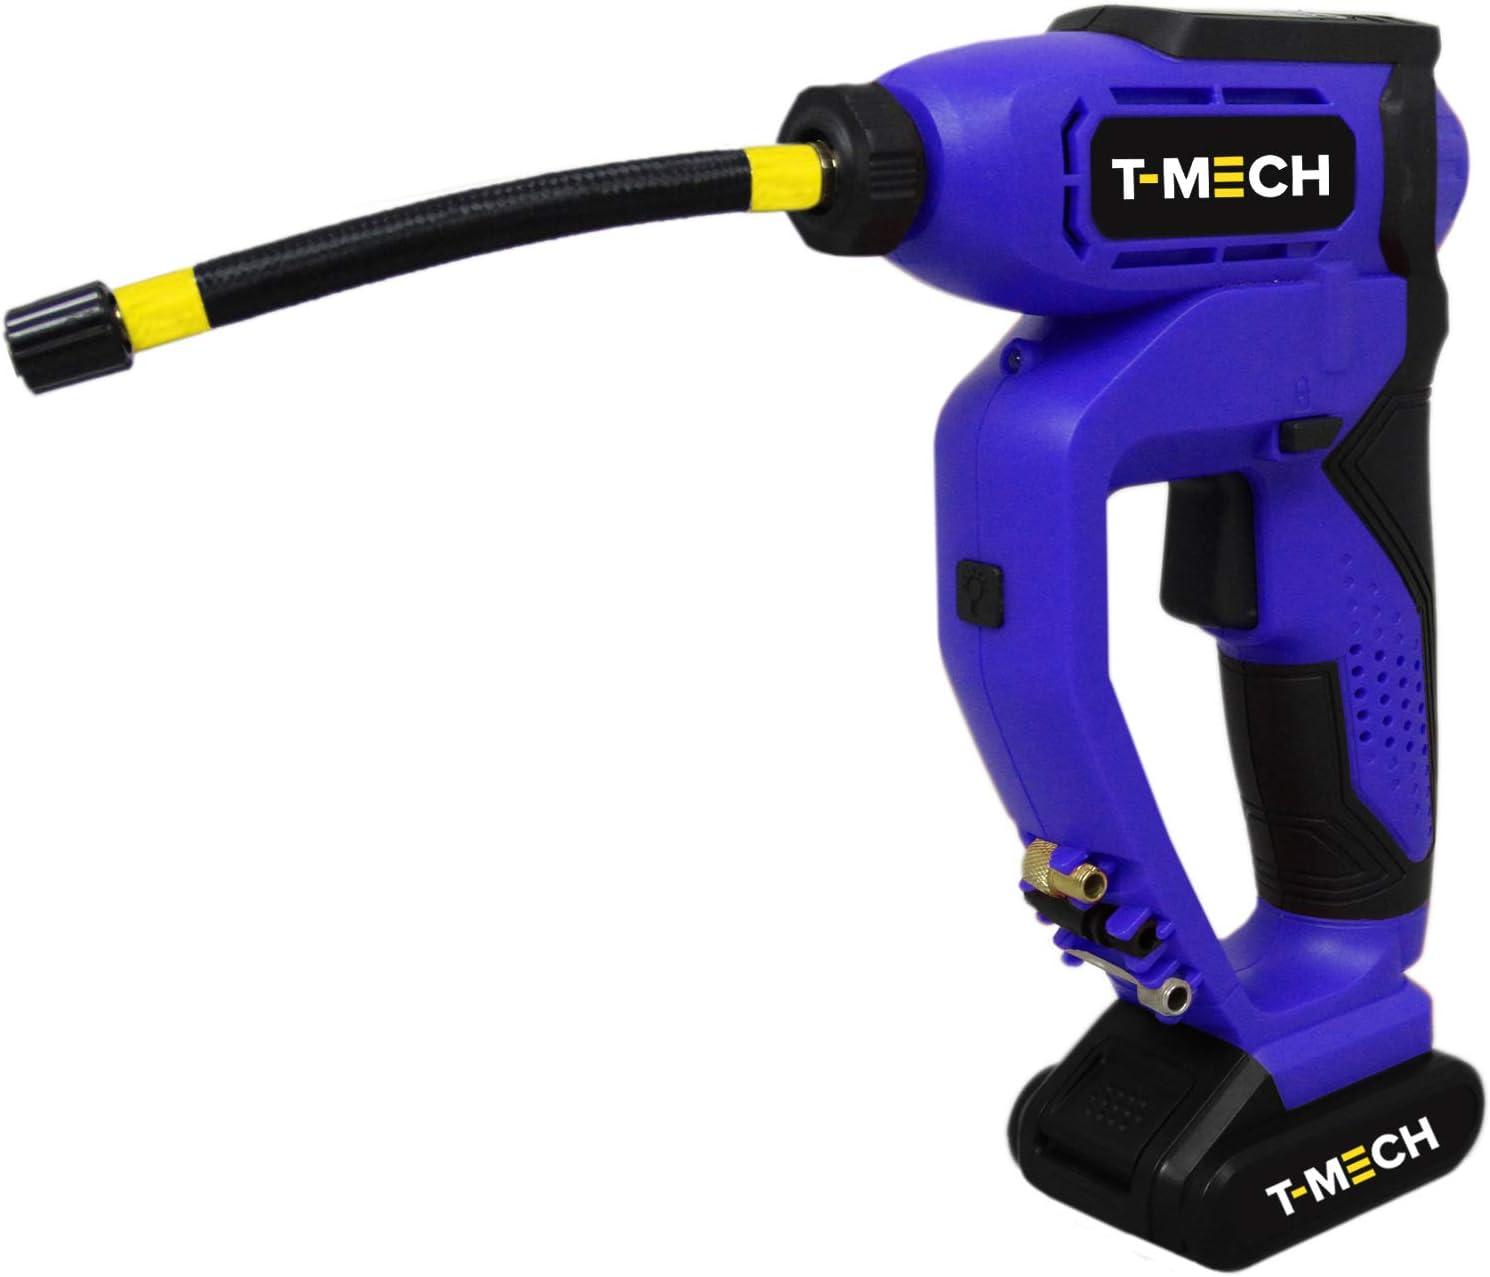 T-Mech Compresor de Aire Coche Portatil Bomba Inflador 12V DC para ...